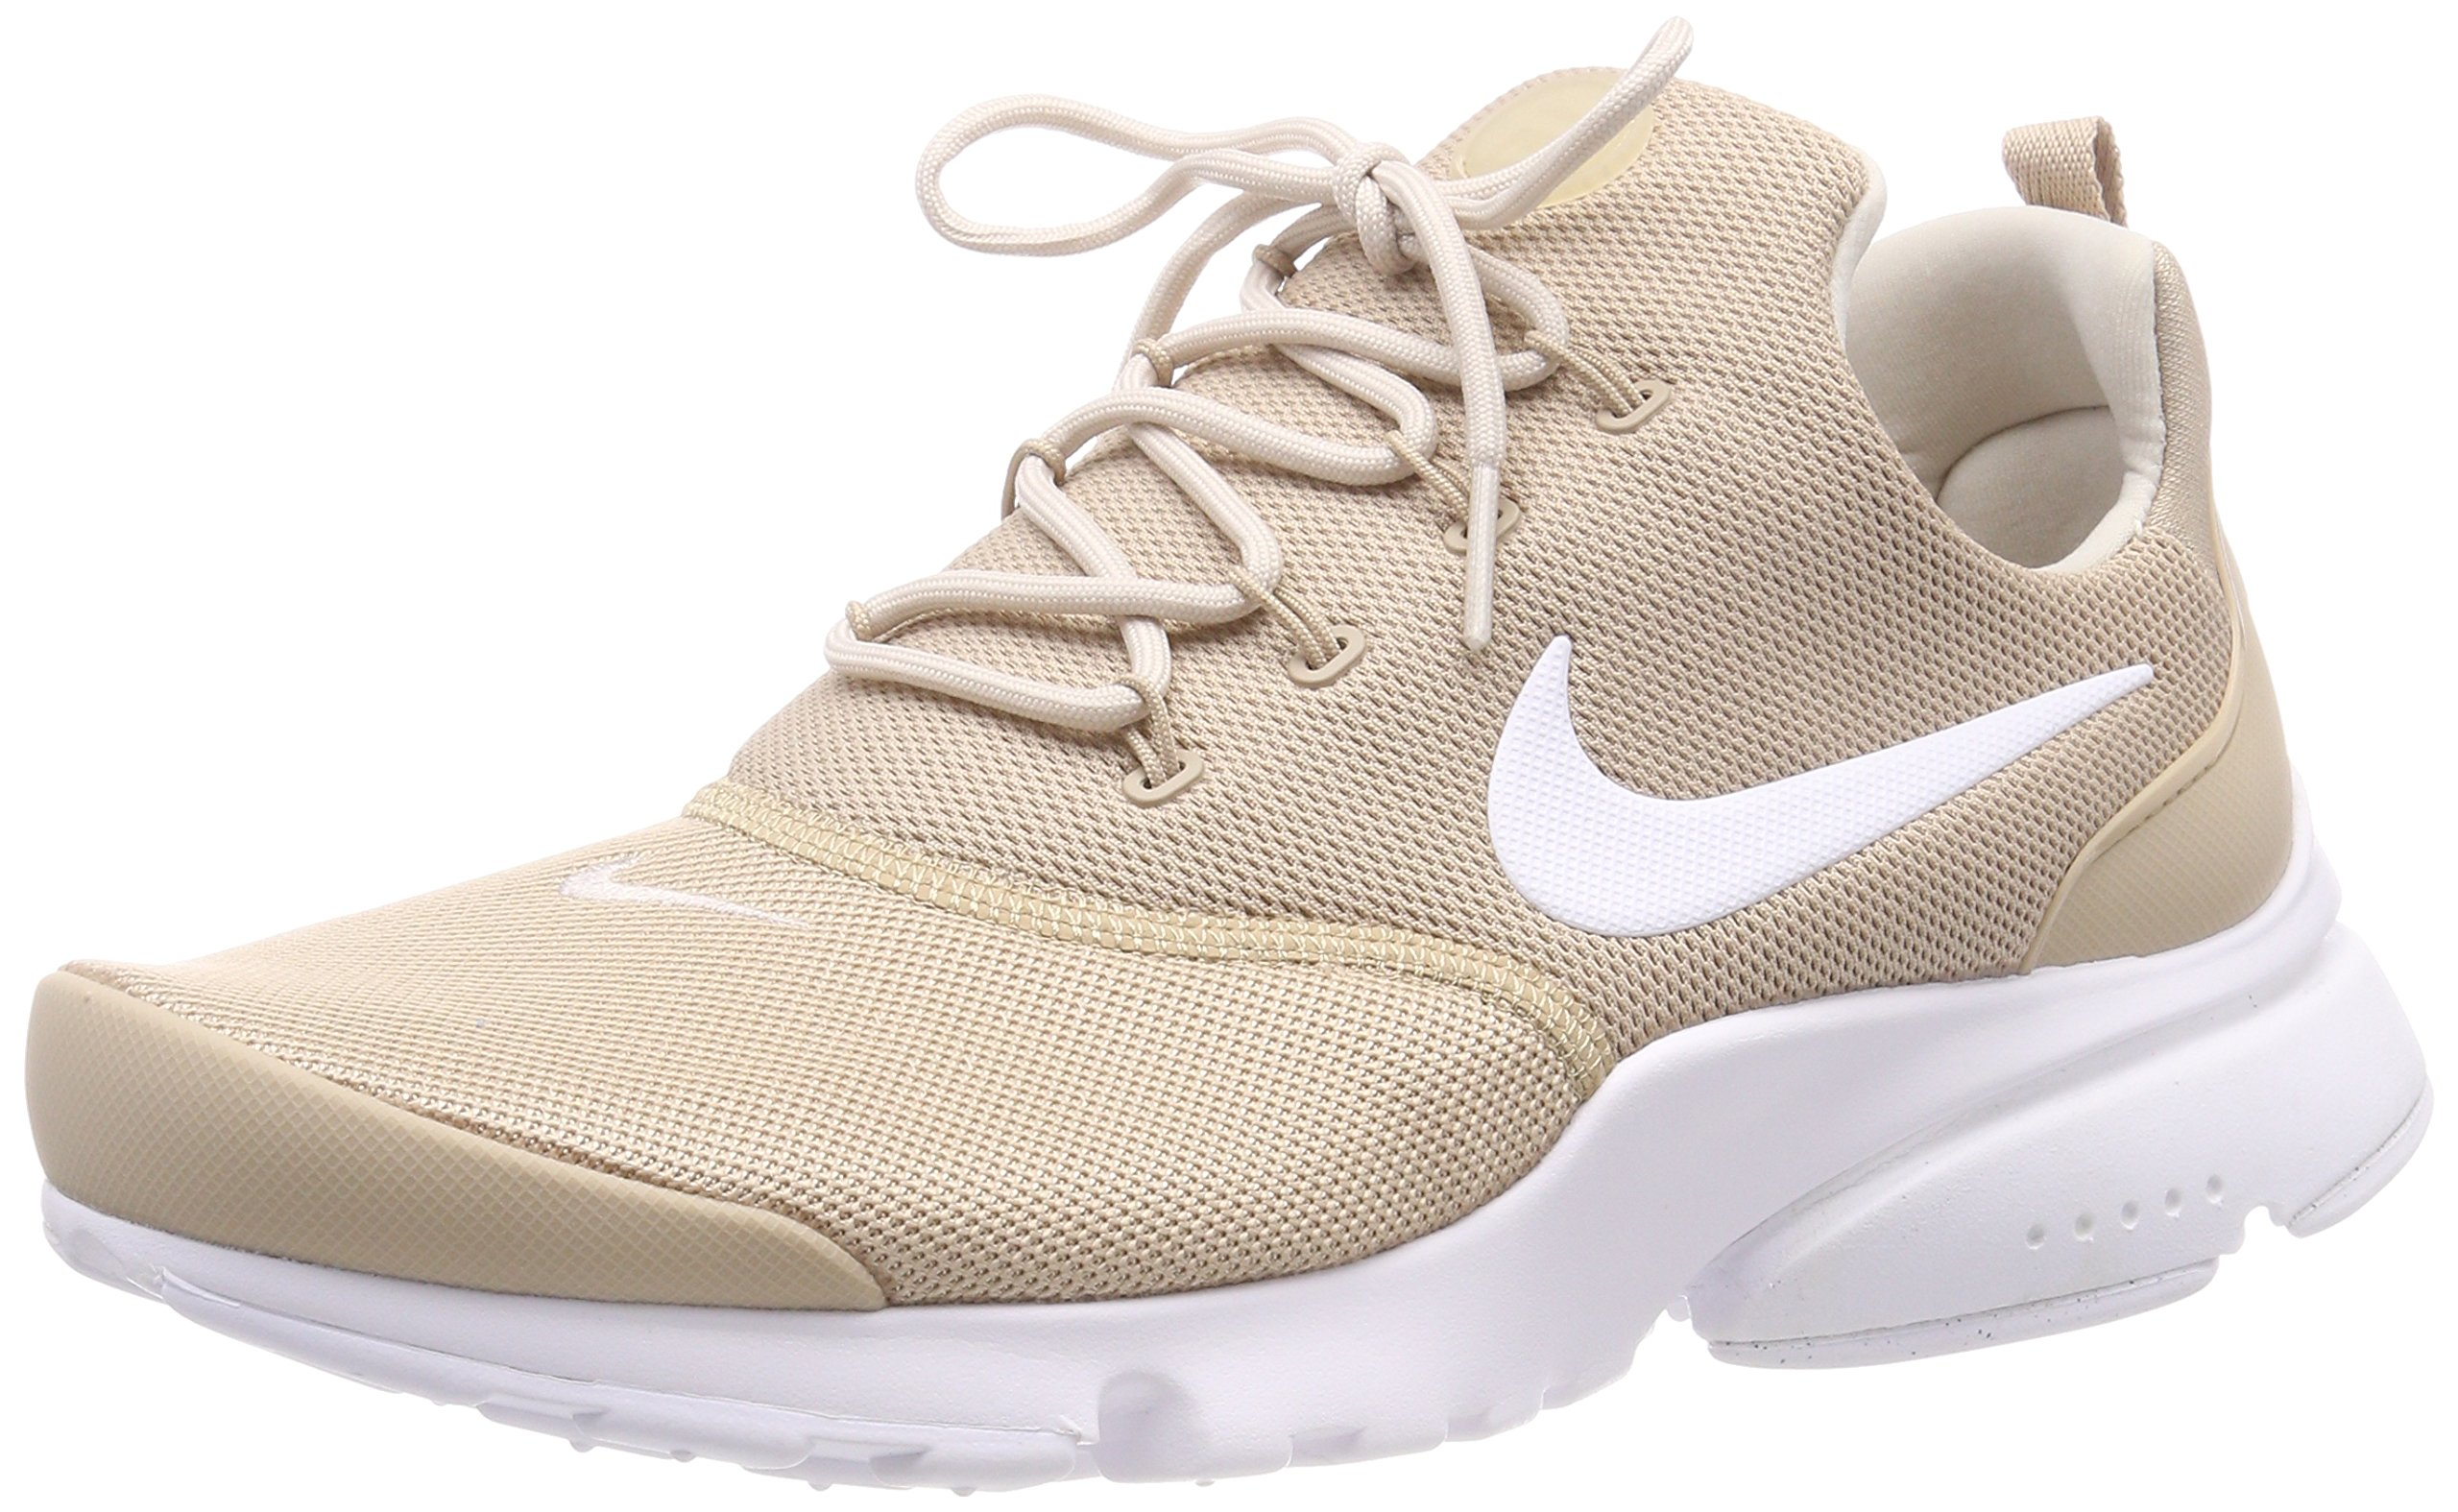 separation shoes 2609c 7f0d9 Galleon - Nike Women s Presto Fly Fashion Sneaker (Sand Desert Sand-White, 6  B(M) US)